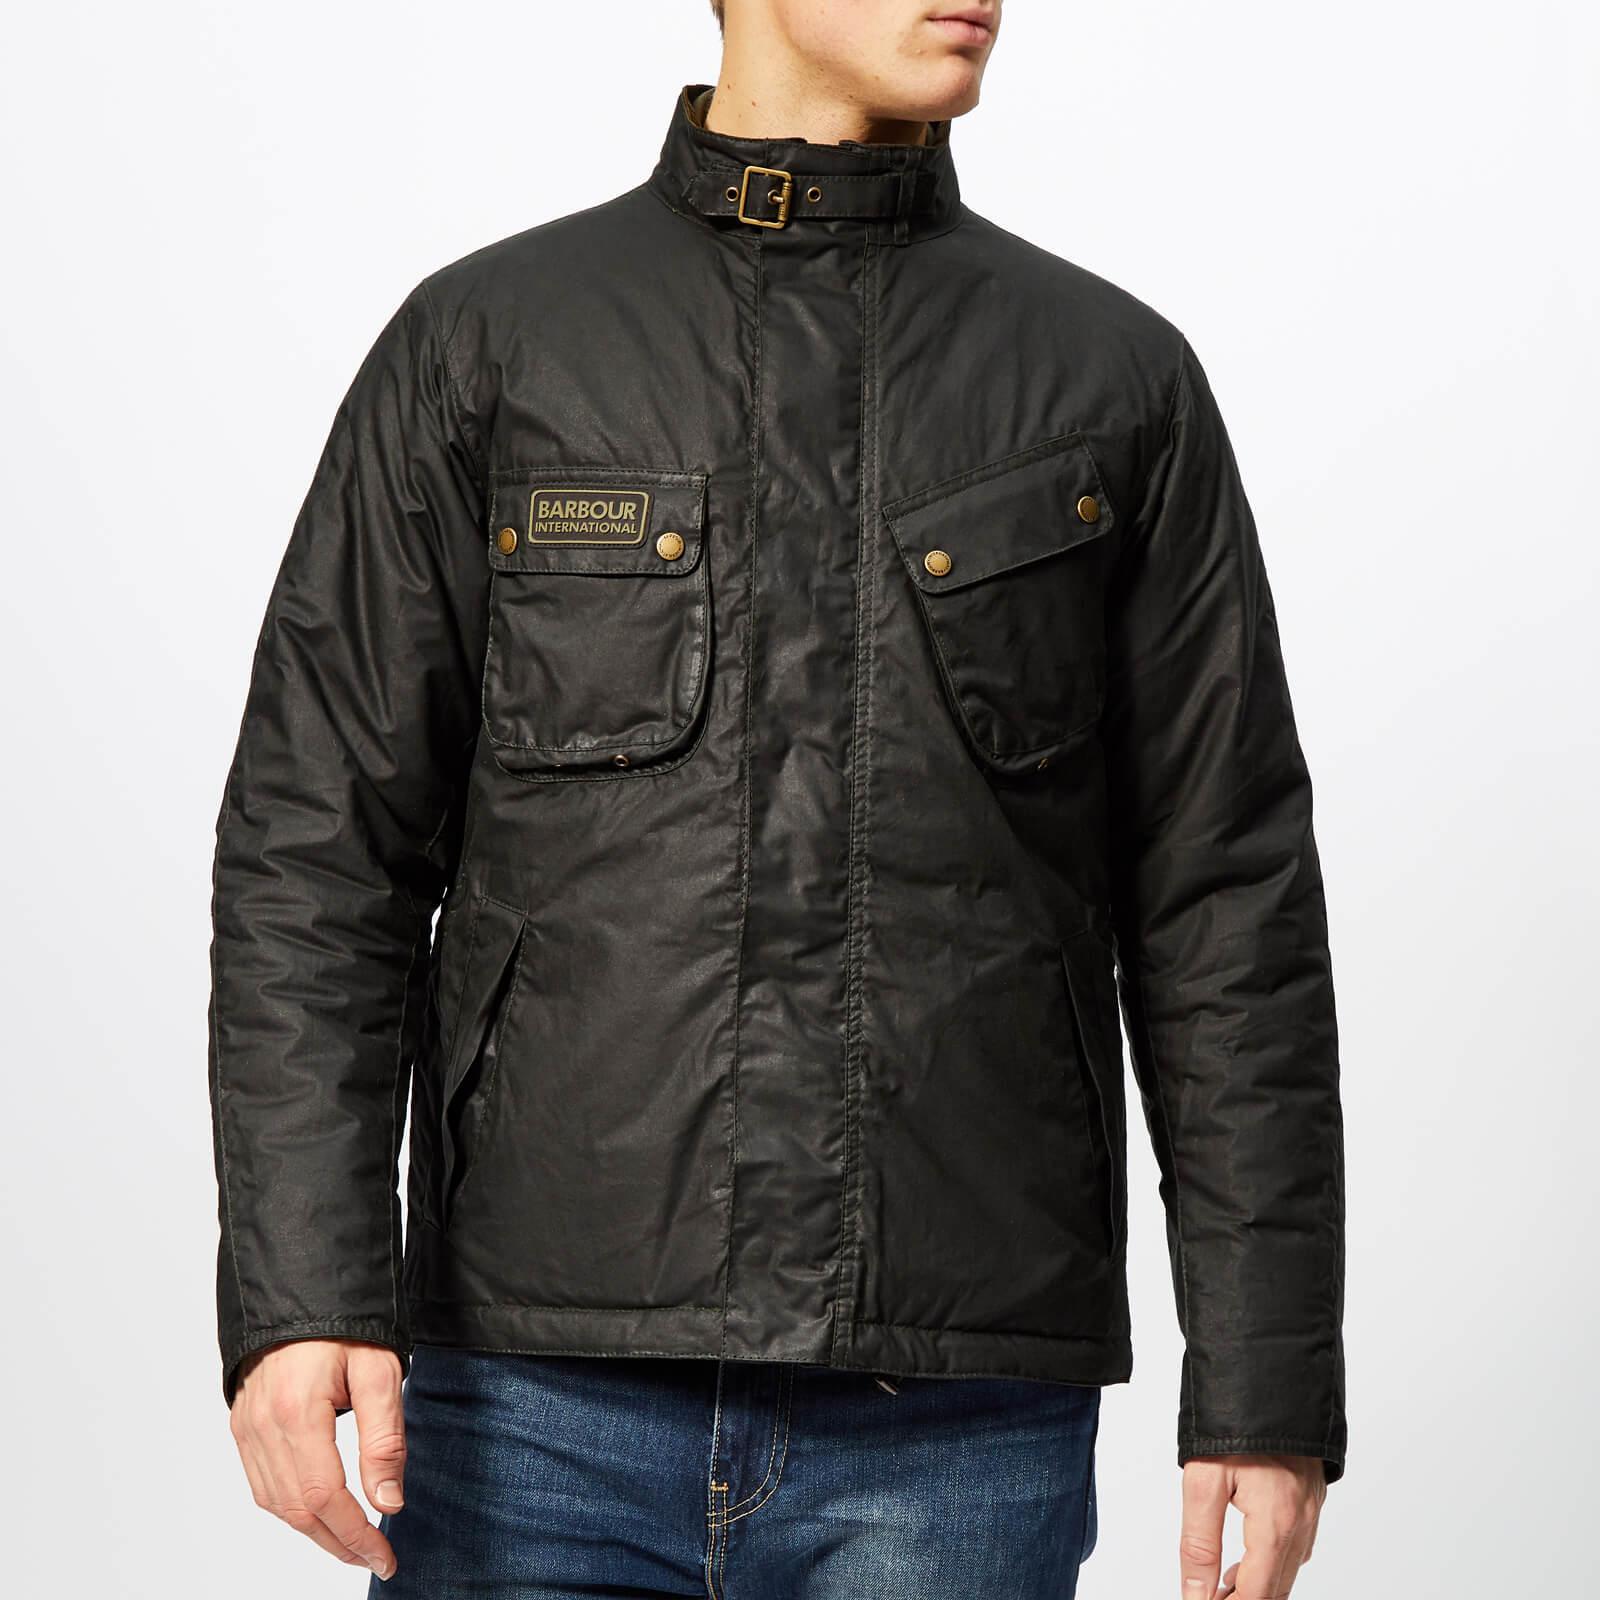 658340743d4 Lyst - Barbour Lever Wax Jacket in Green for Men